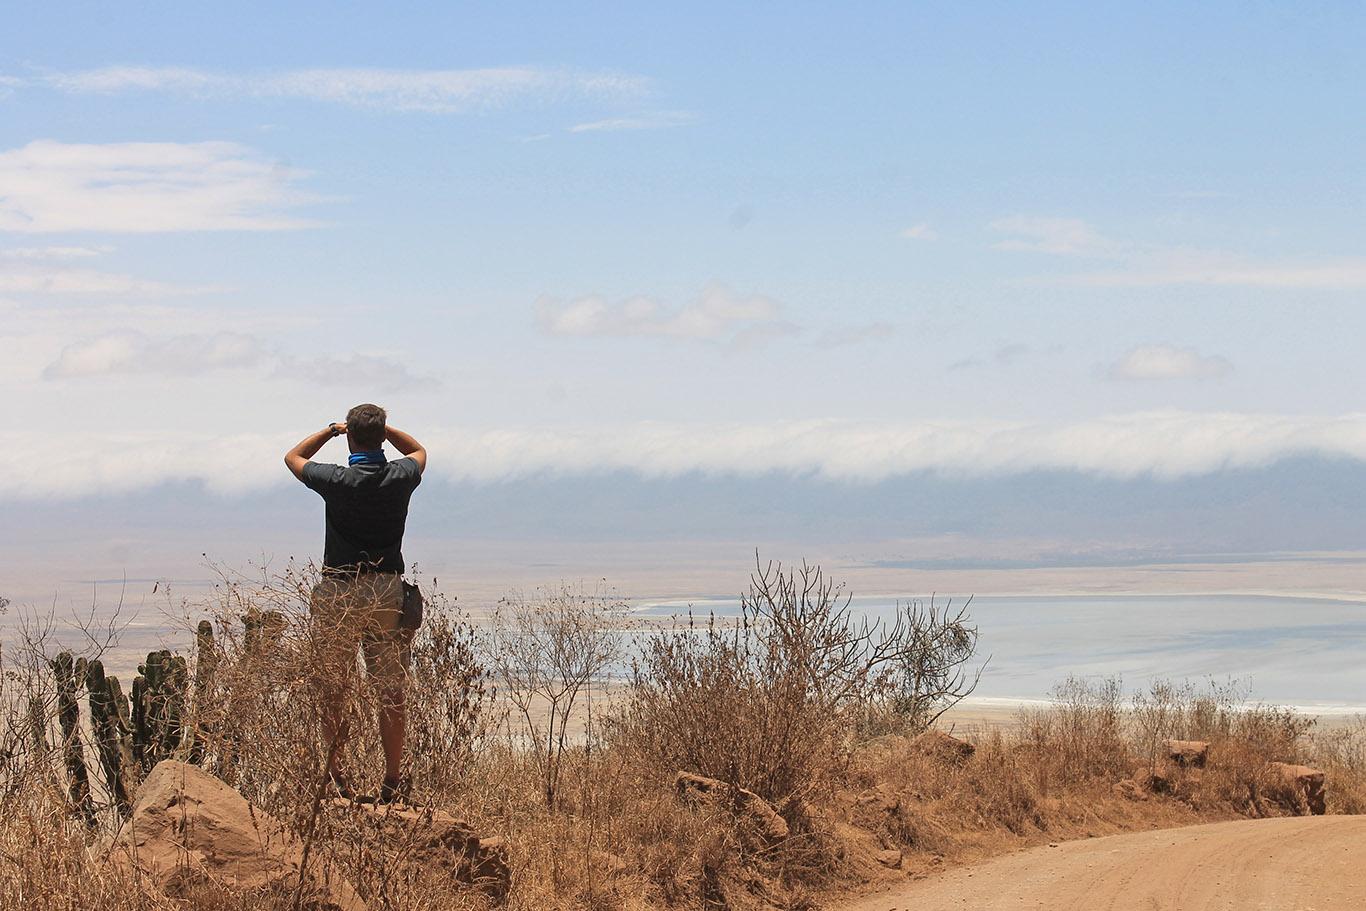 tanzania-vista-viaggio-zeppelin